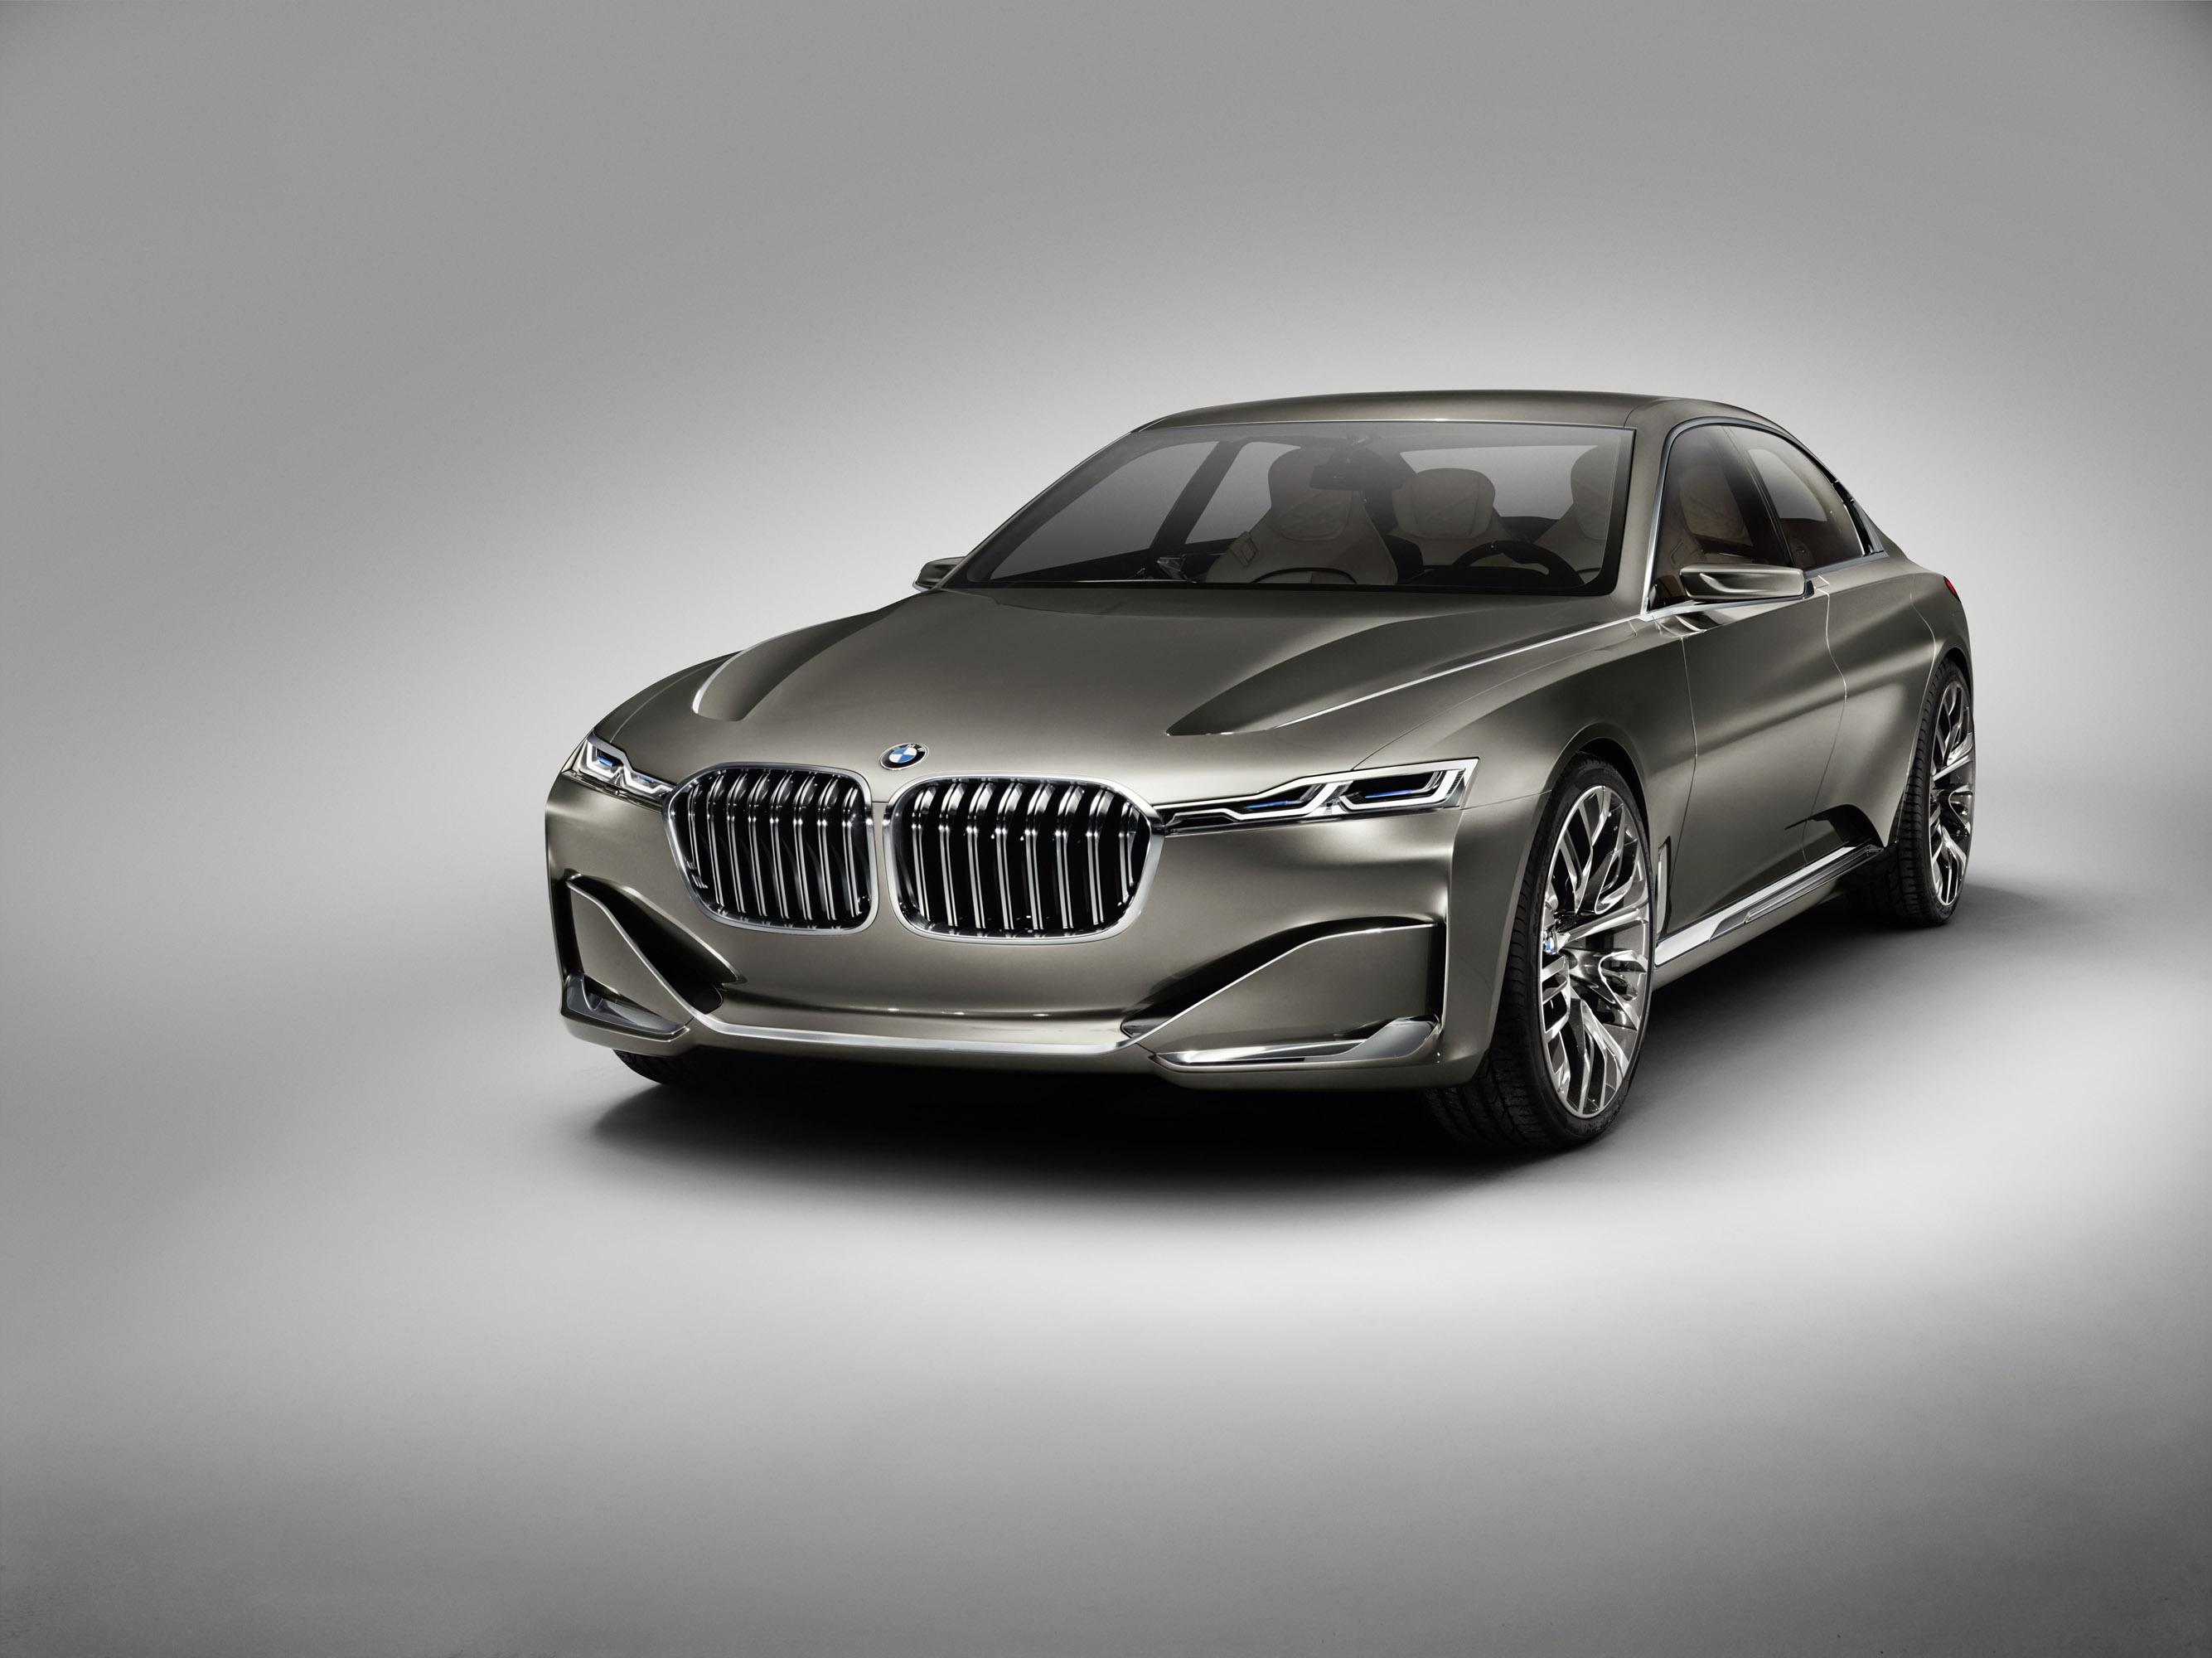 BMW Vision Future Luxury Concept photo #1